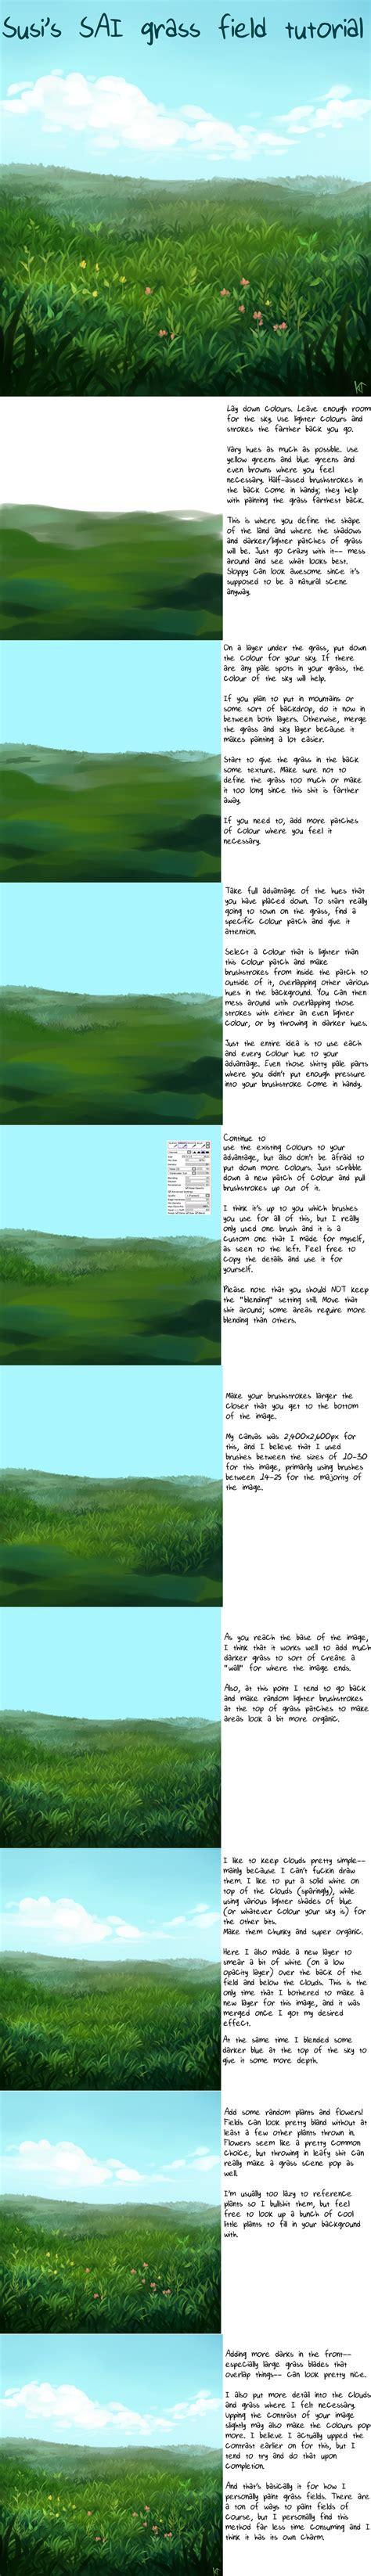 paint tool sai grass tutorial pe background tutorials by rydi1689 on deviantart